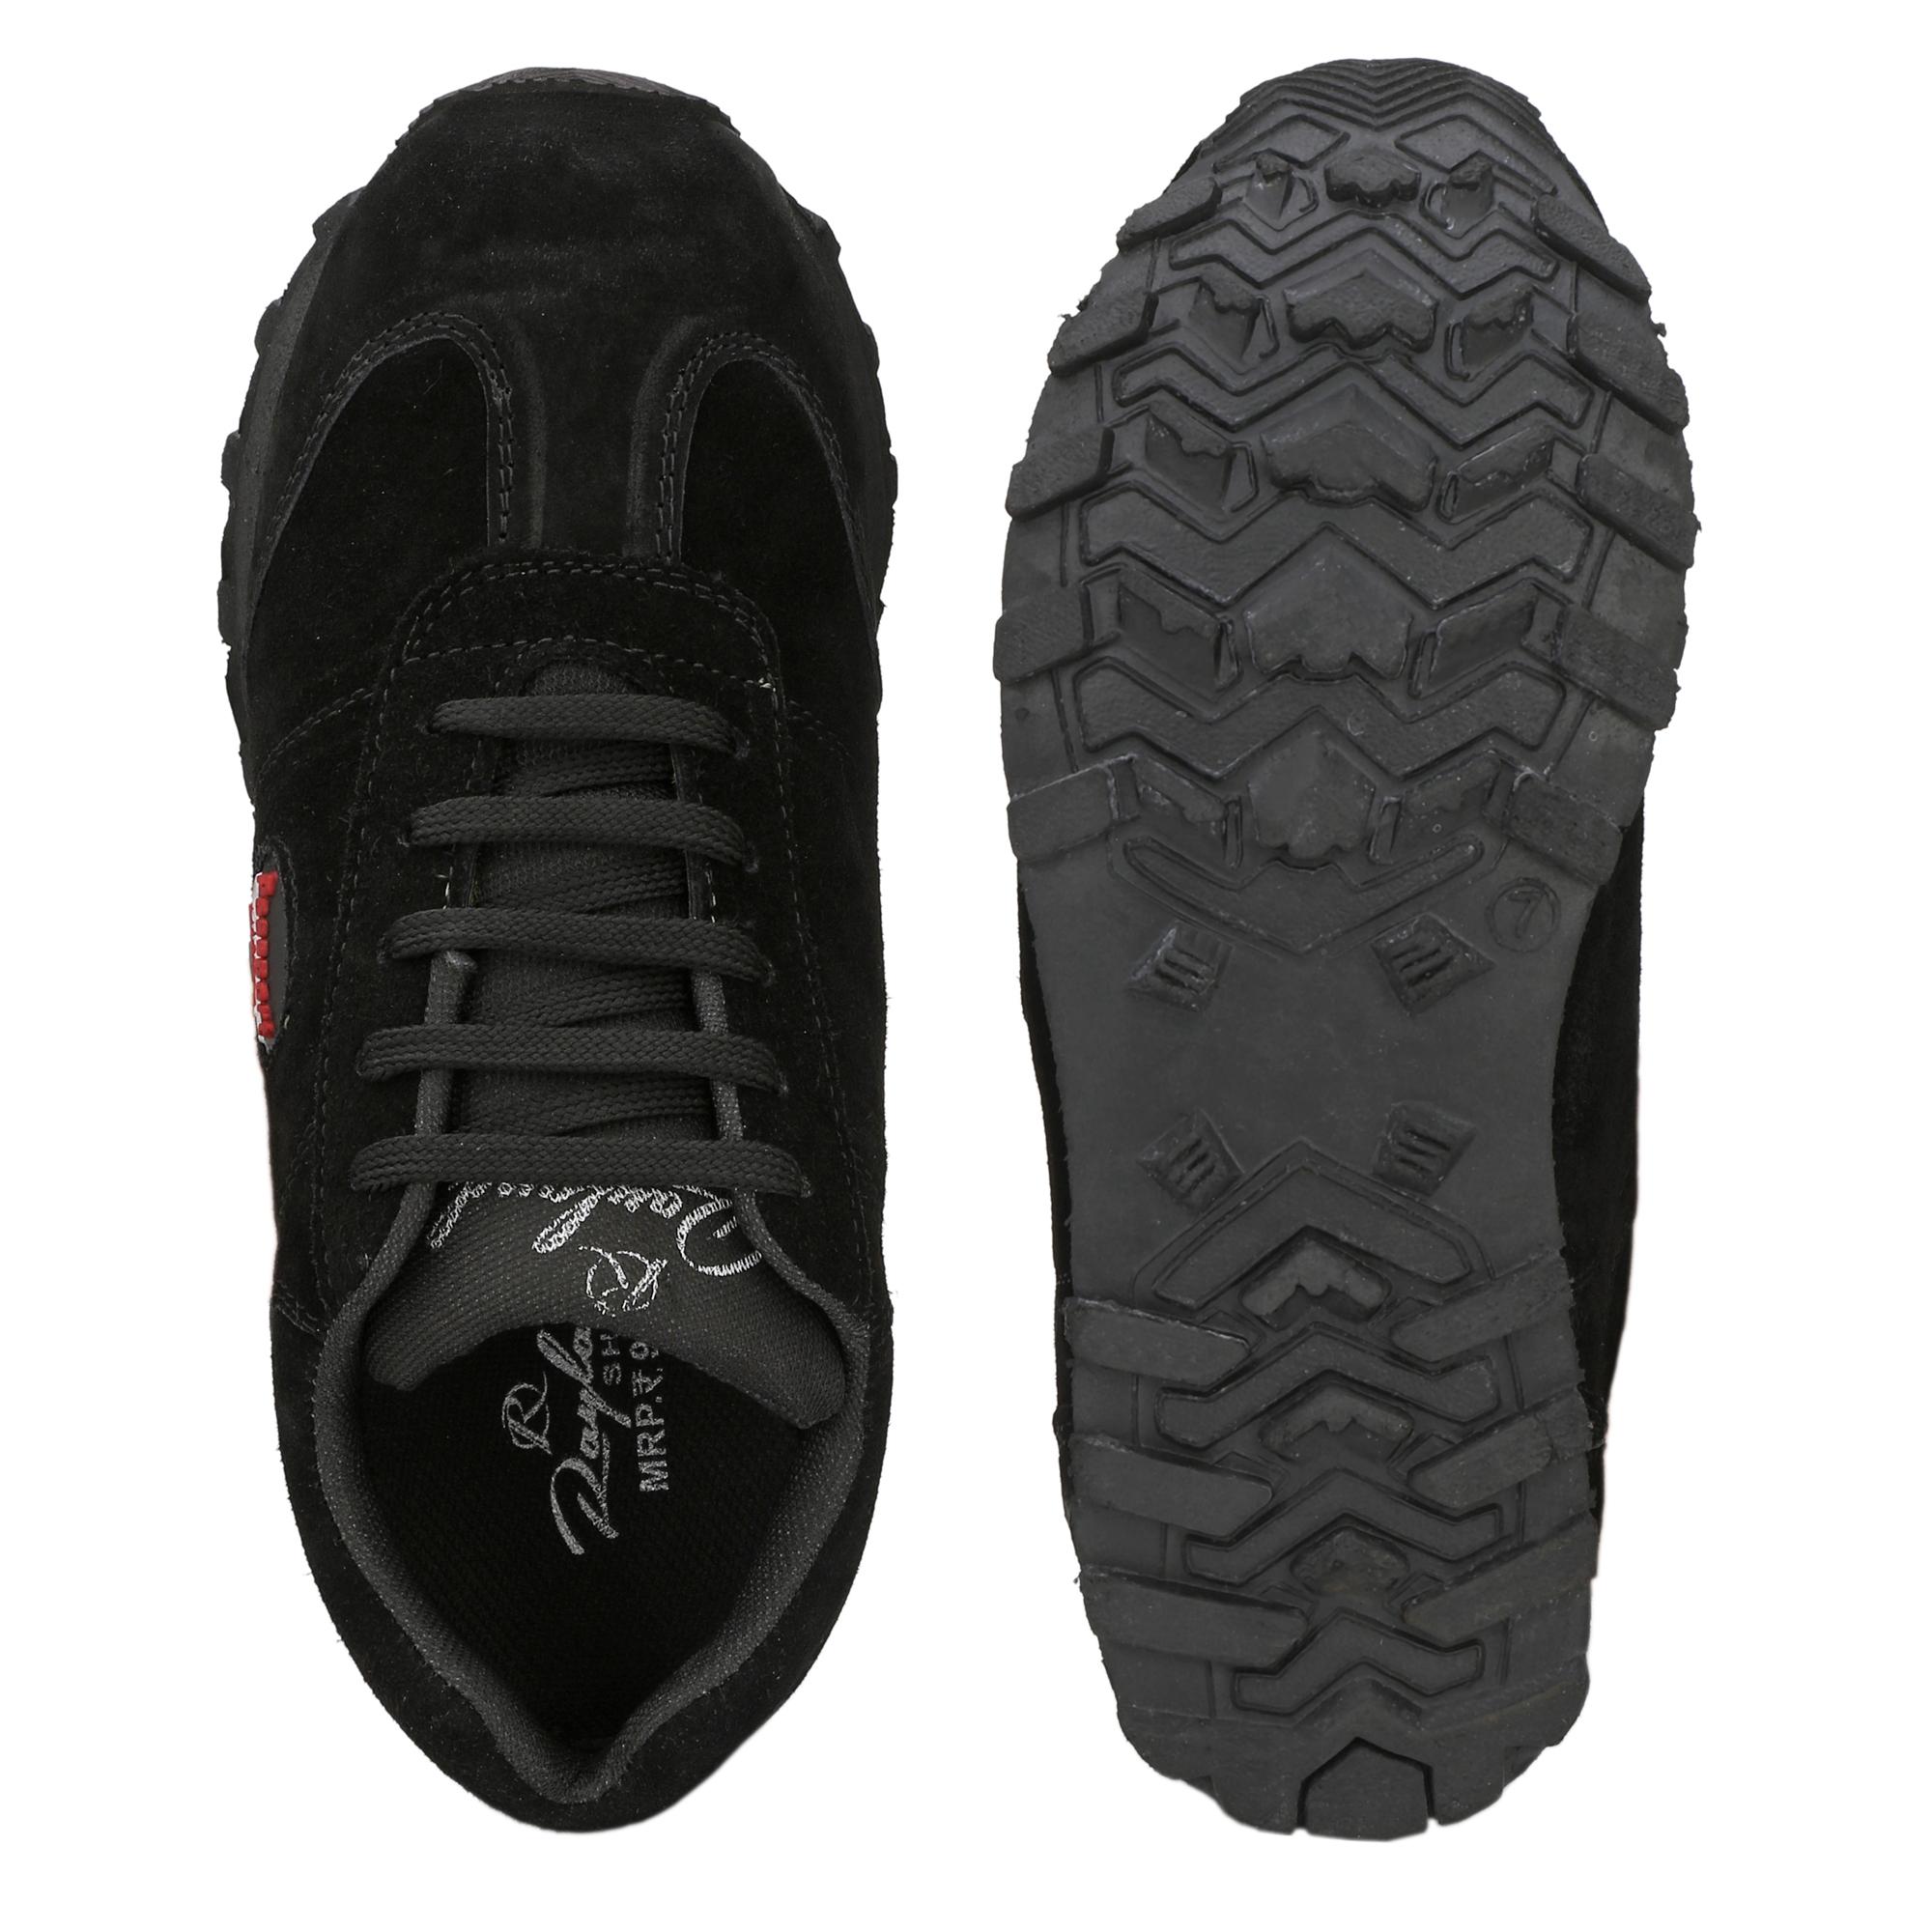 Good Minar New Loafer Shoes For Men's Gm1263 (BLACK, 6-10, 8 PAIR)